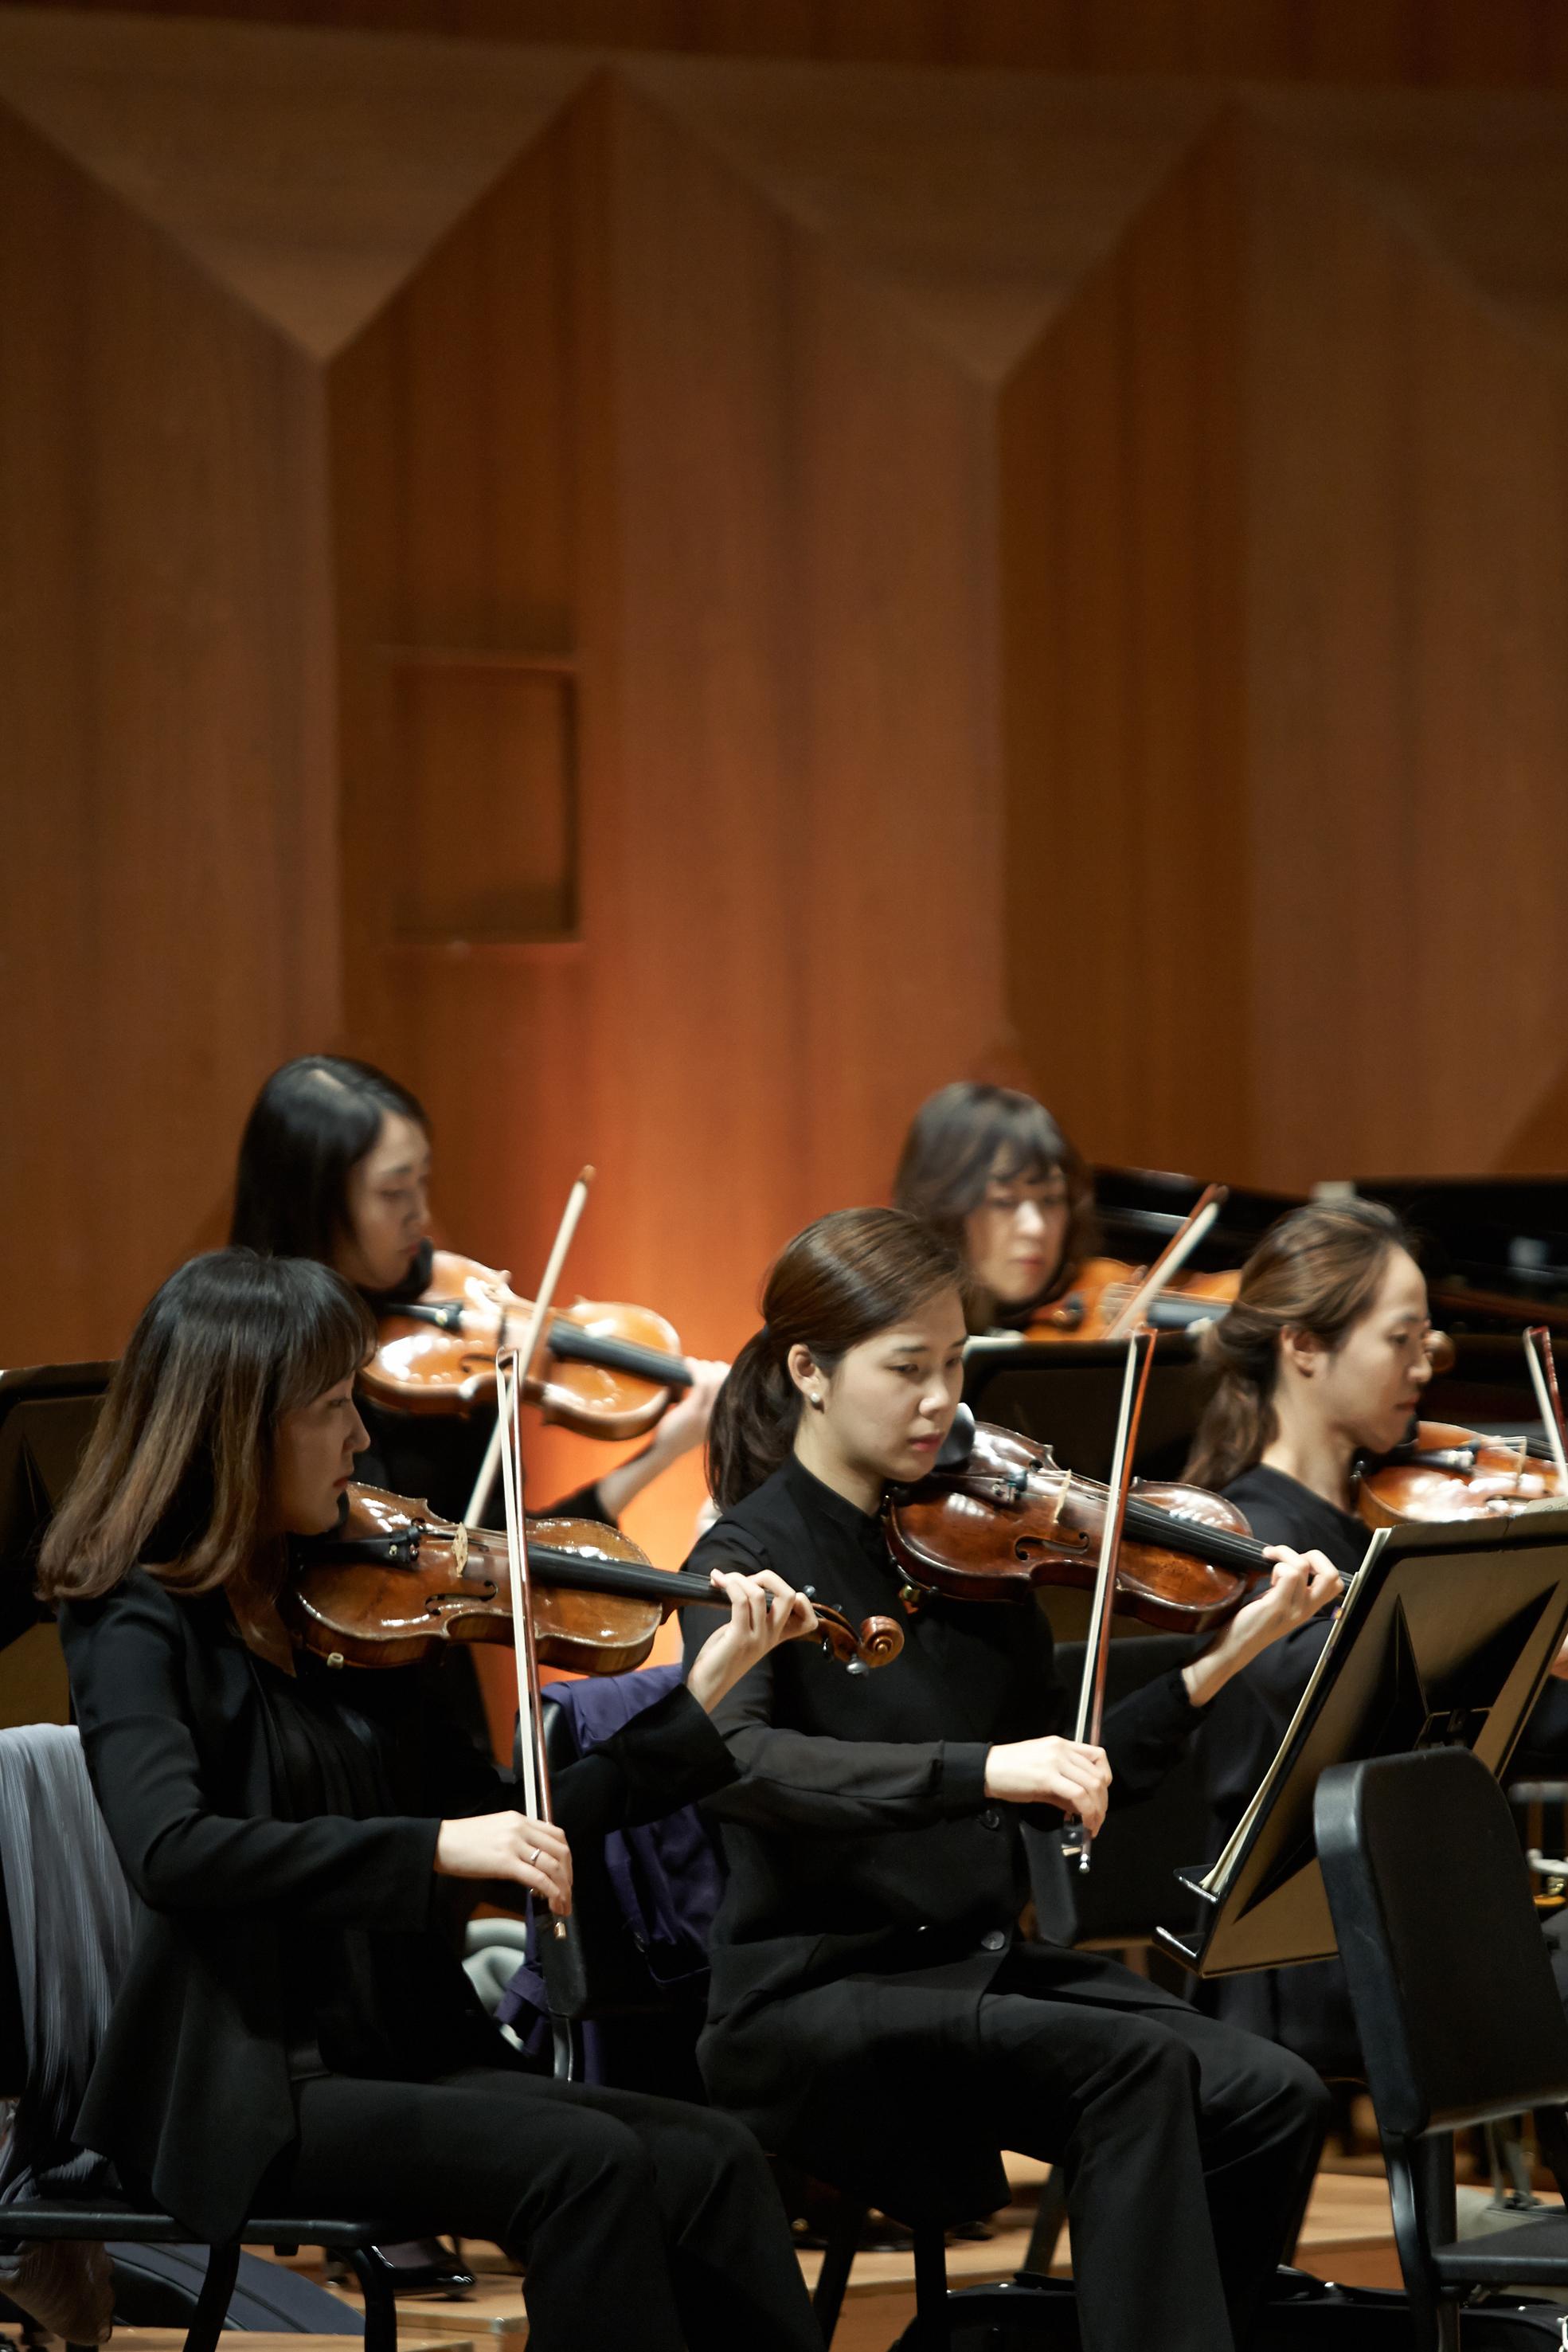 20150404 Cr sympony Gyeonggi Philharmonic 03.jpg